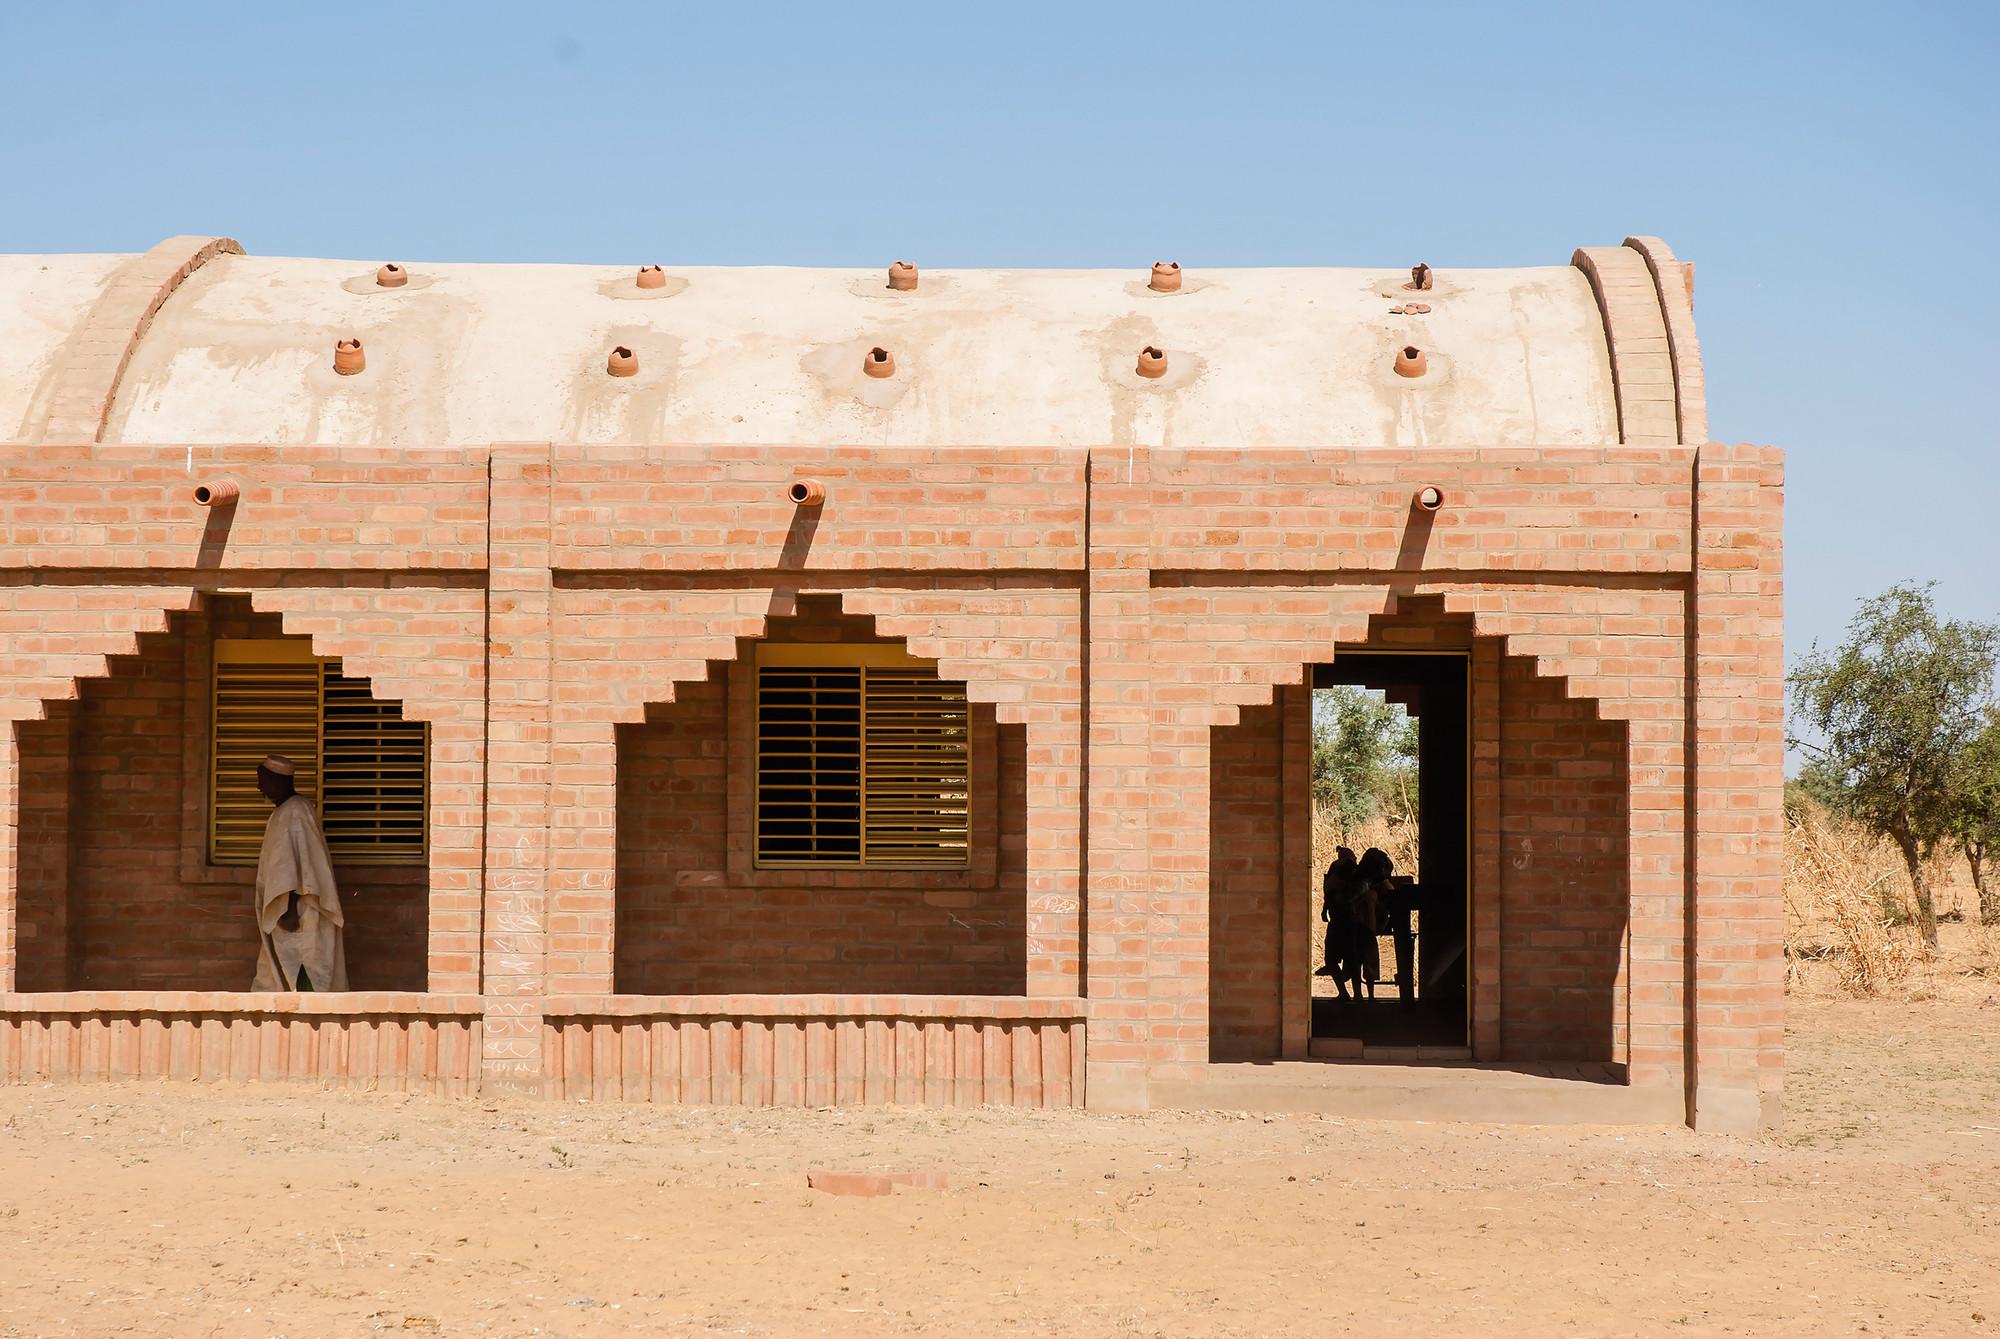 Primary School Tanouan Ibi  / LEVS architecten, Courtesy of LEVS architecten